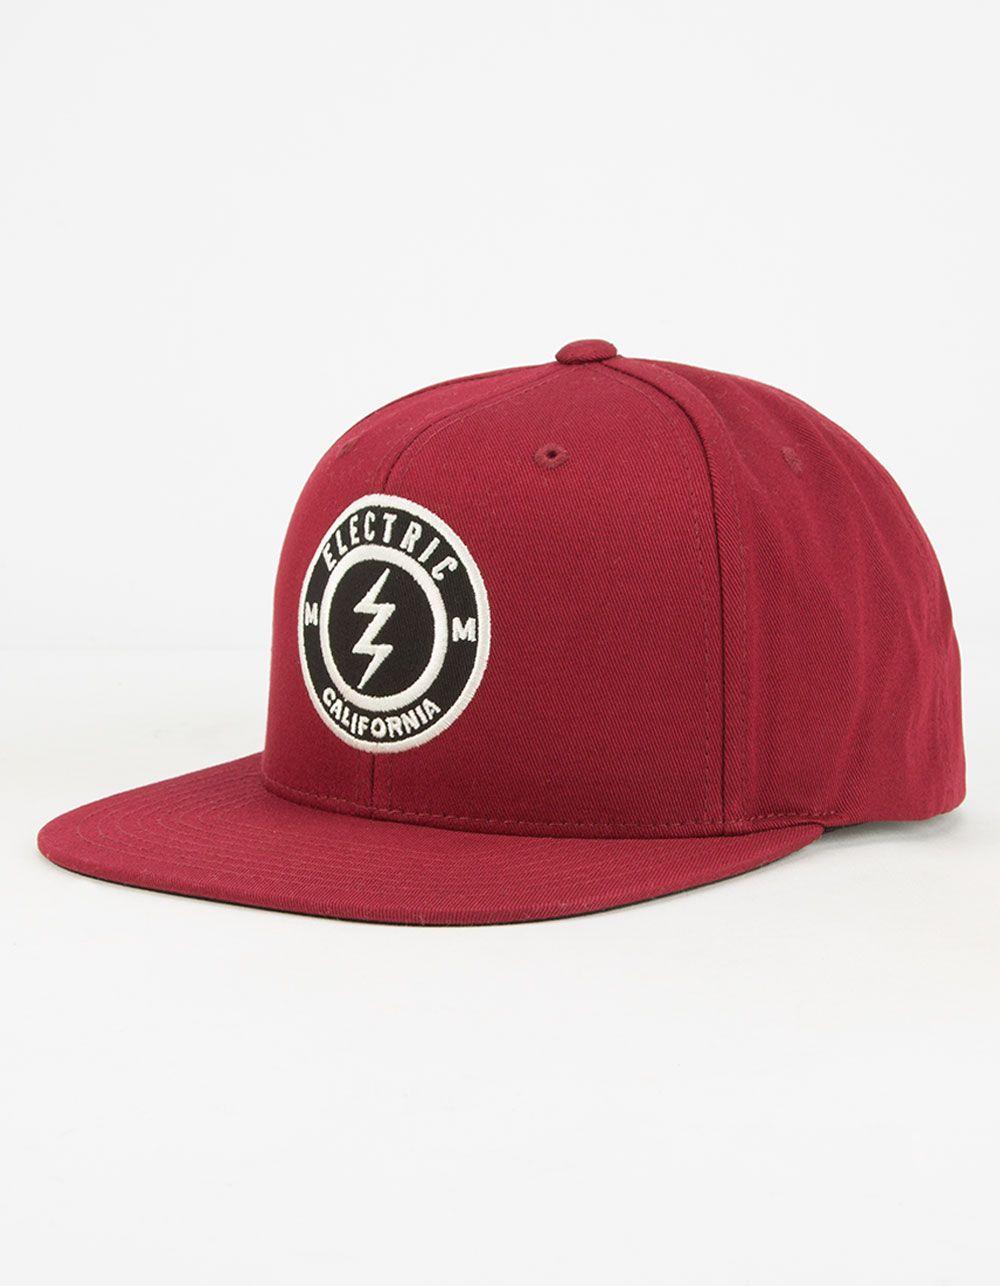 93cd763b9b21 Electric Pensacola II snapback hat. Electric logo embroidery on ...